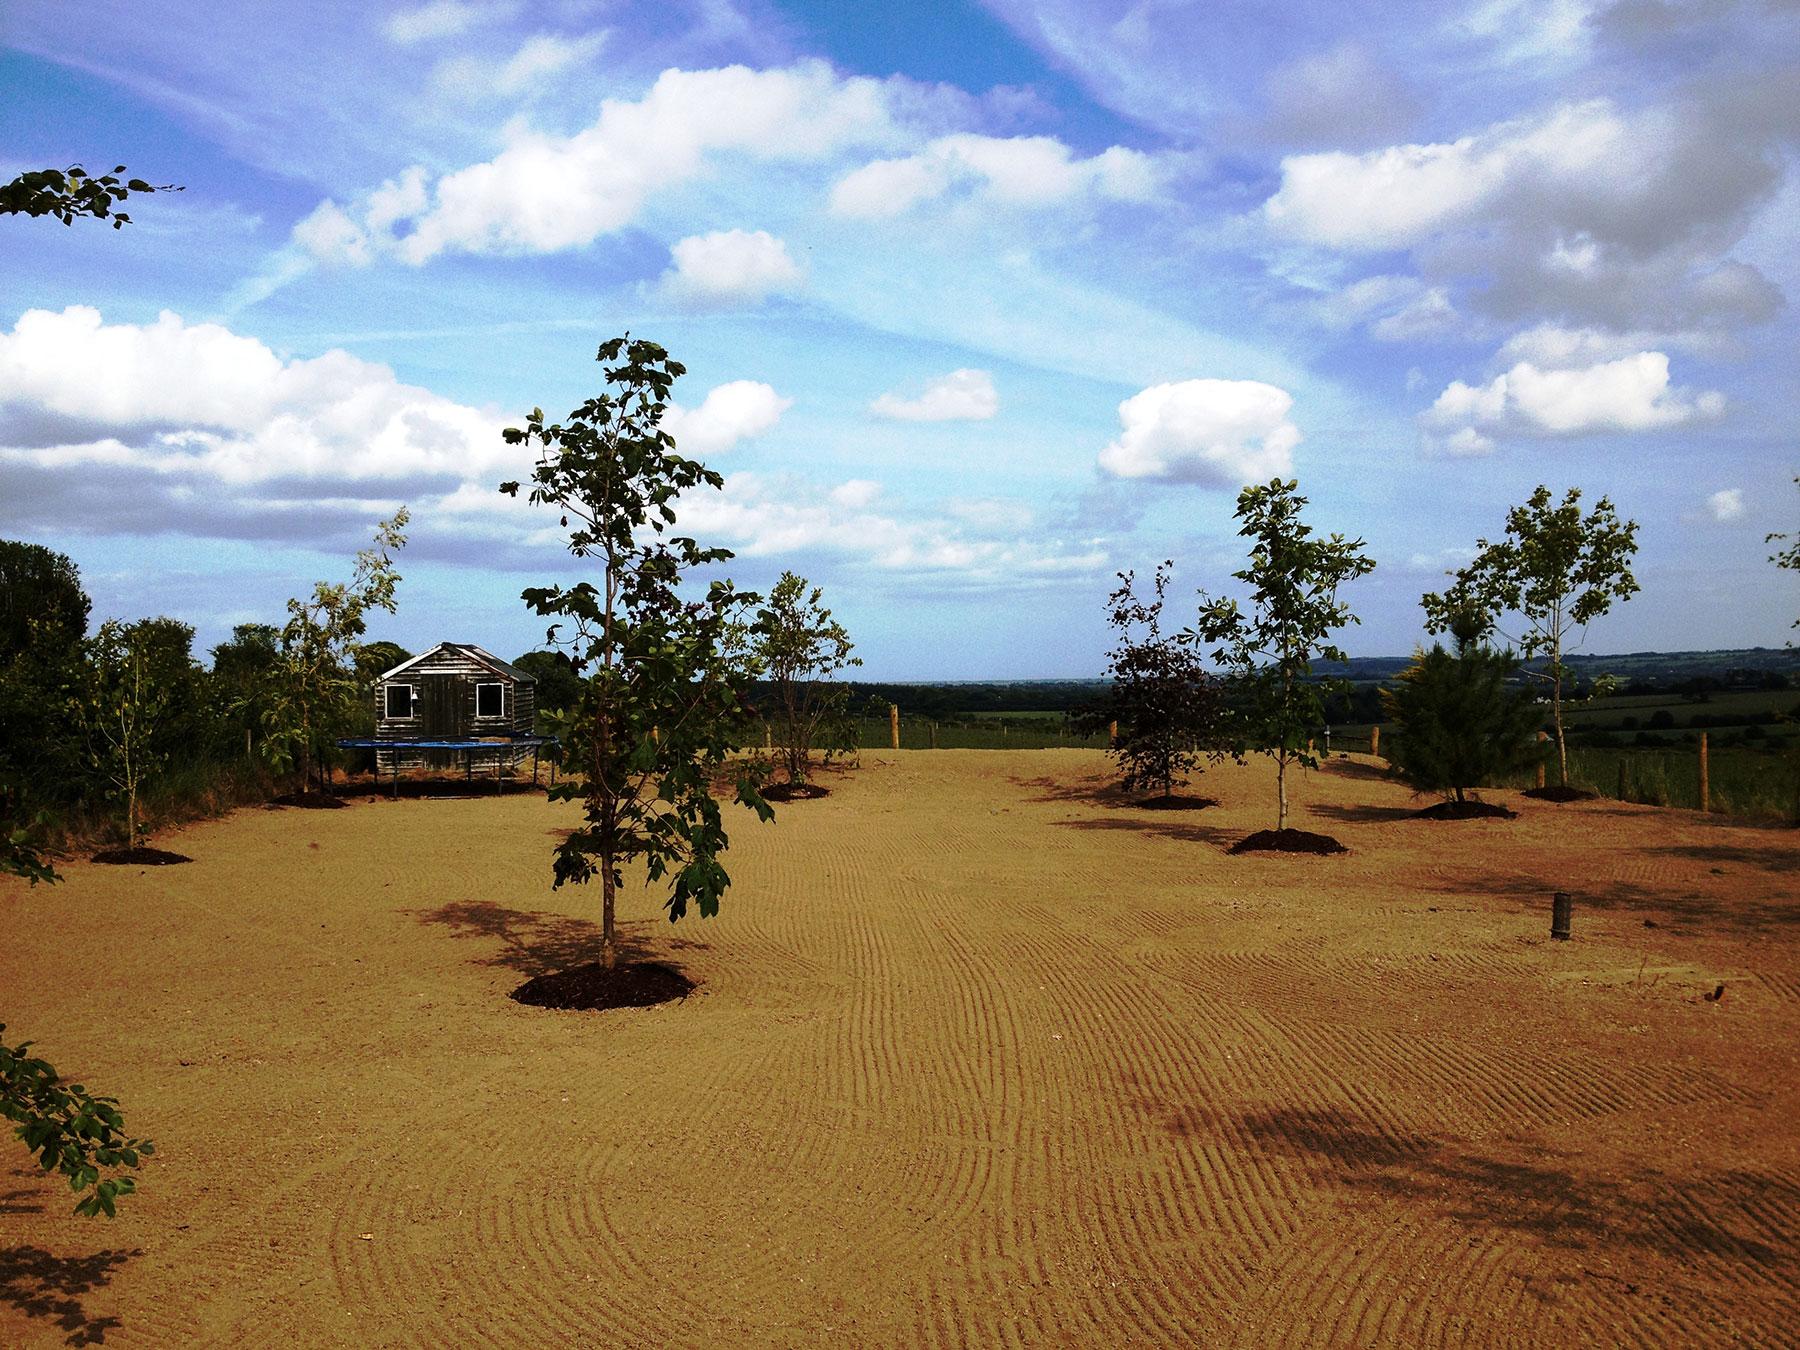 Landscaping design kinbark products ltd for Create landscaping ltd